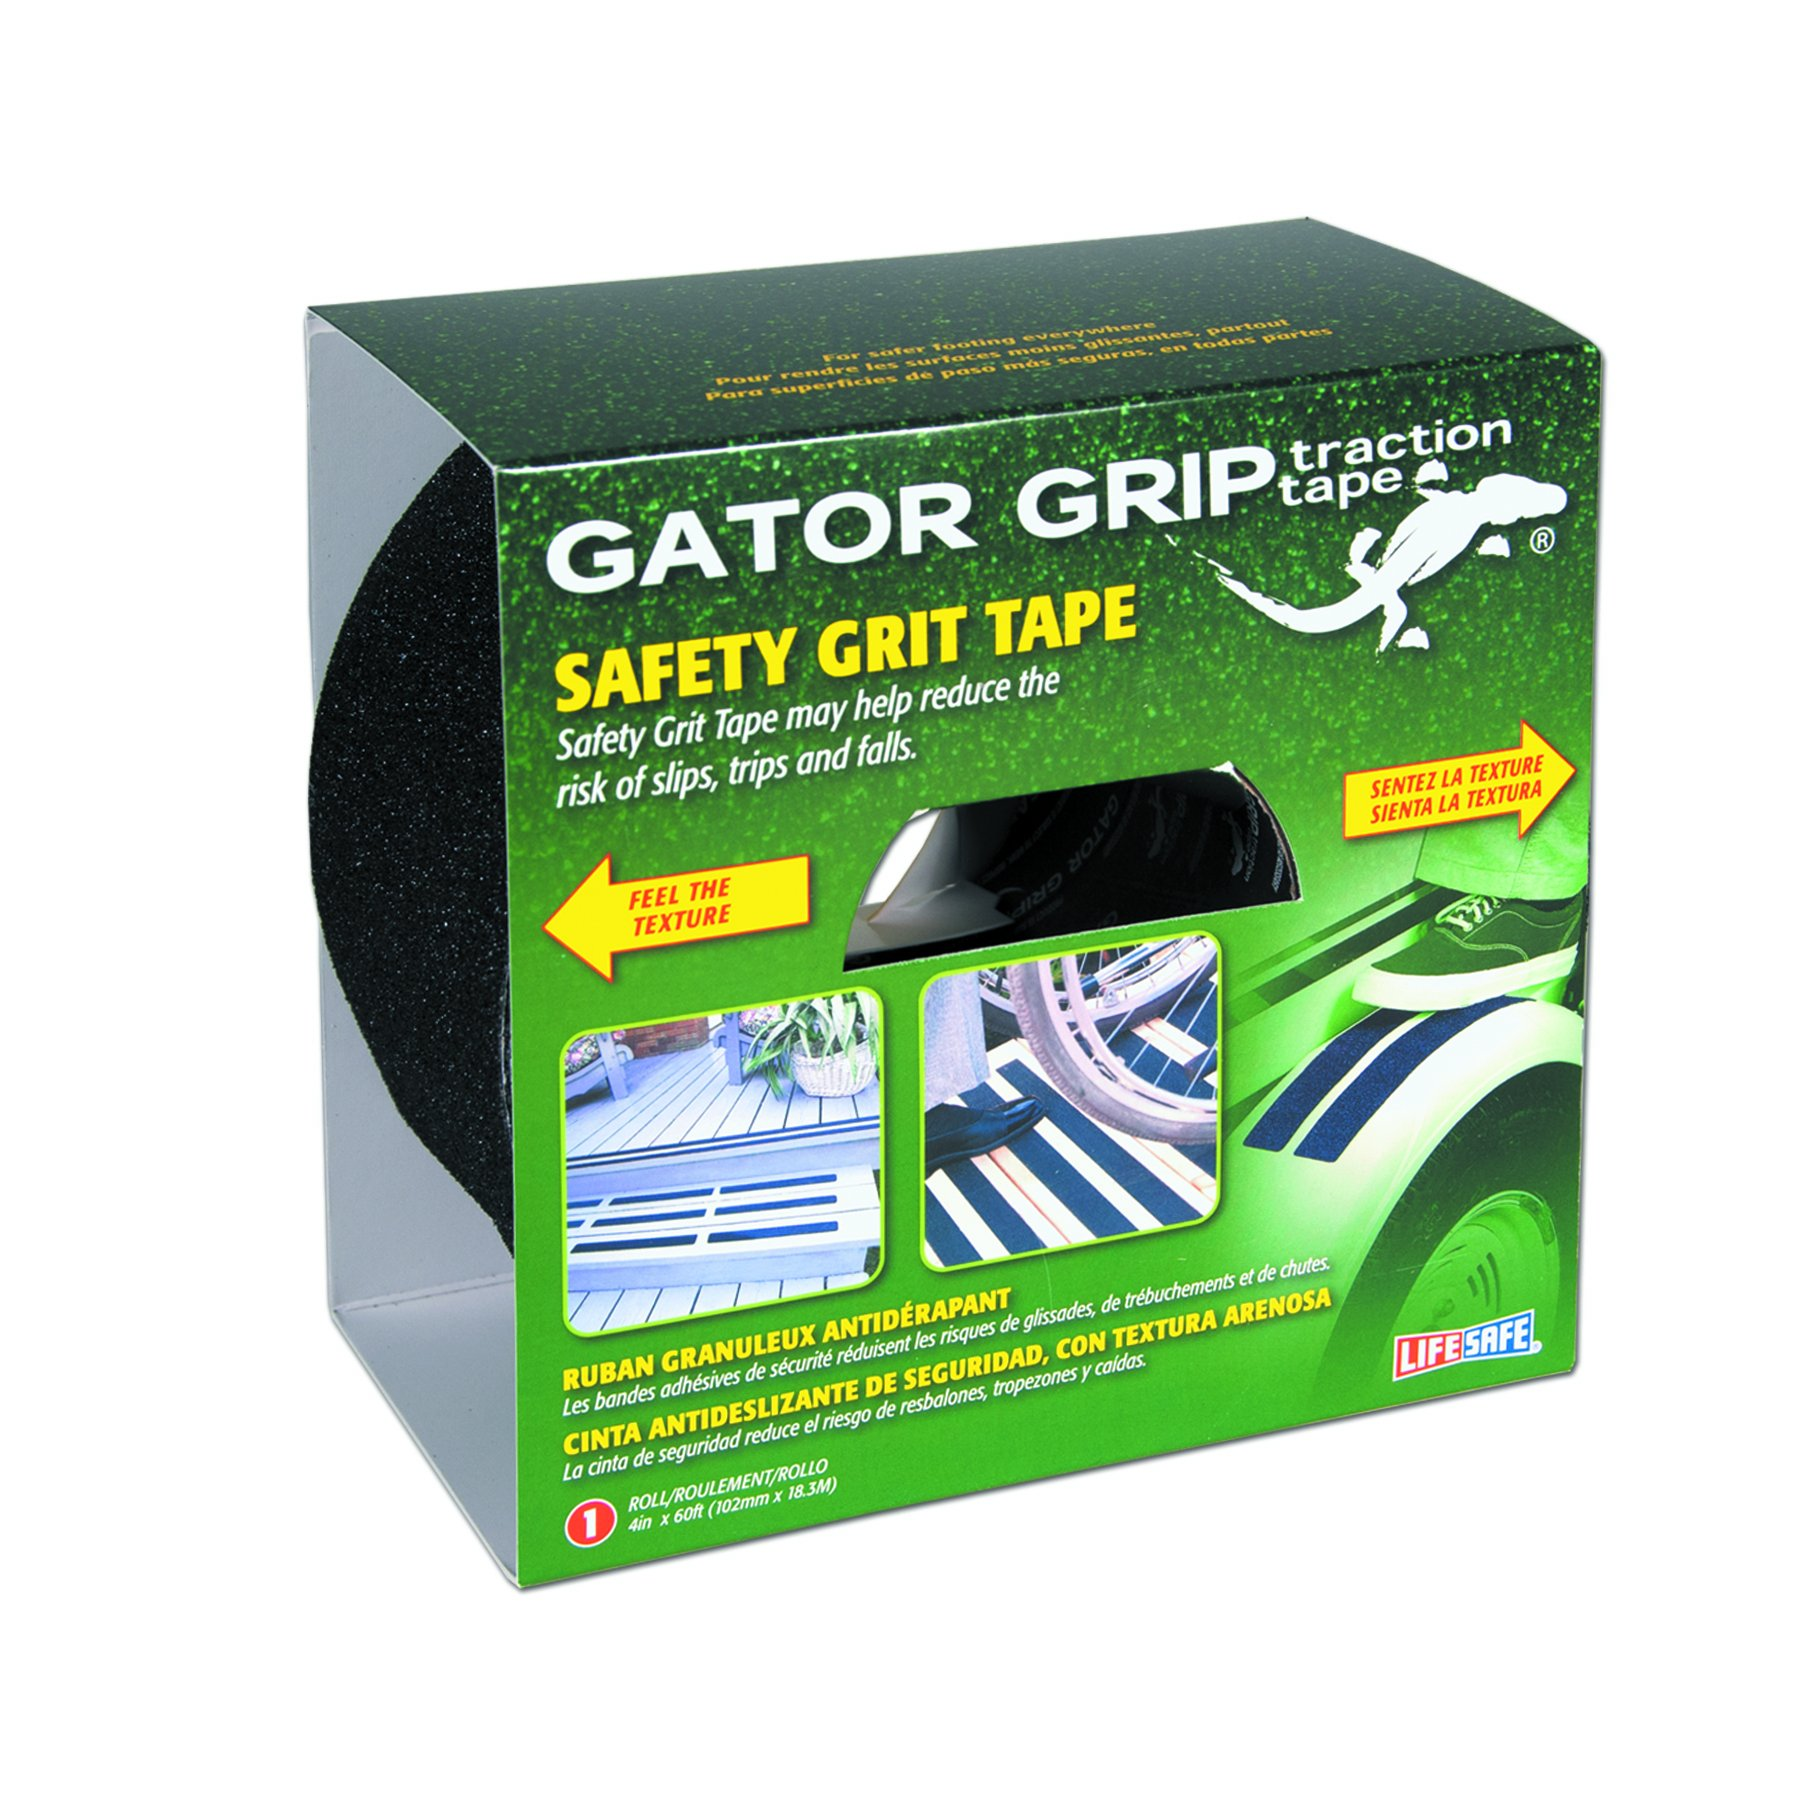 Gator Grip: Anti-Slip Tape, 4'' x 60', Black by Gator Grip